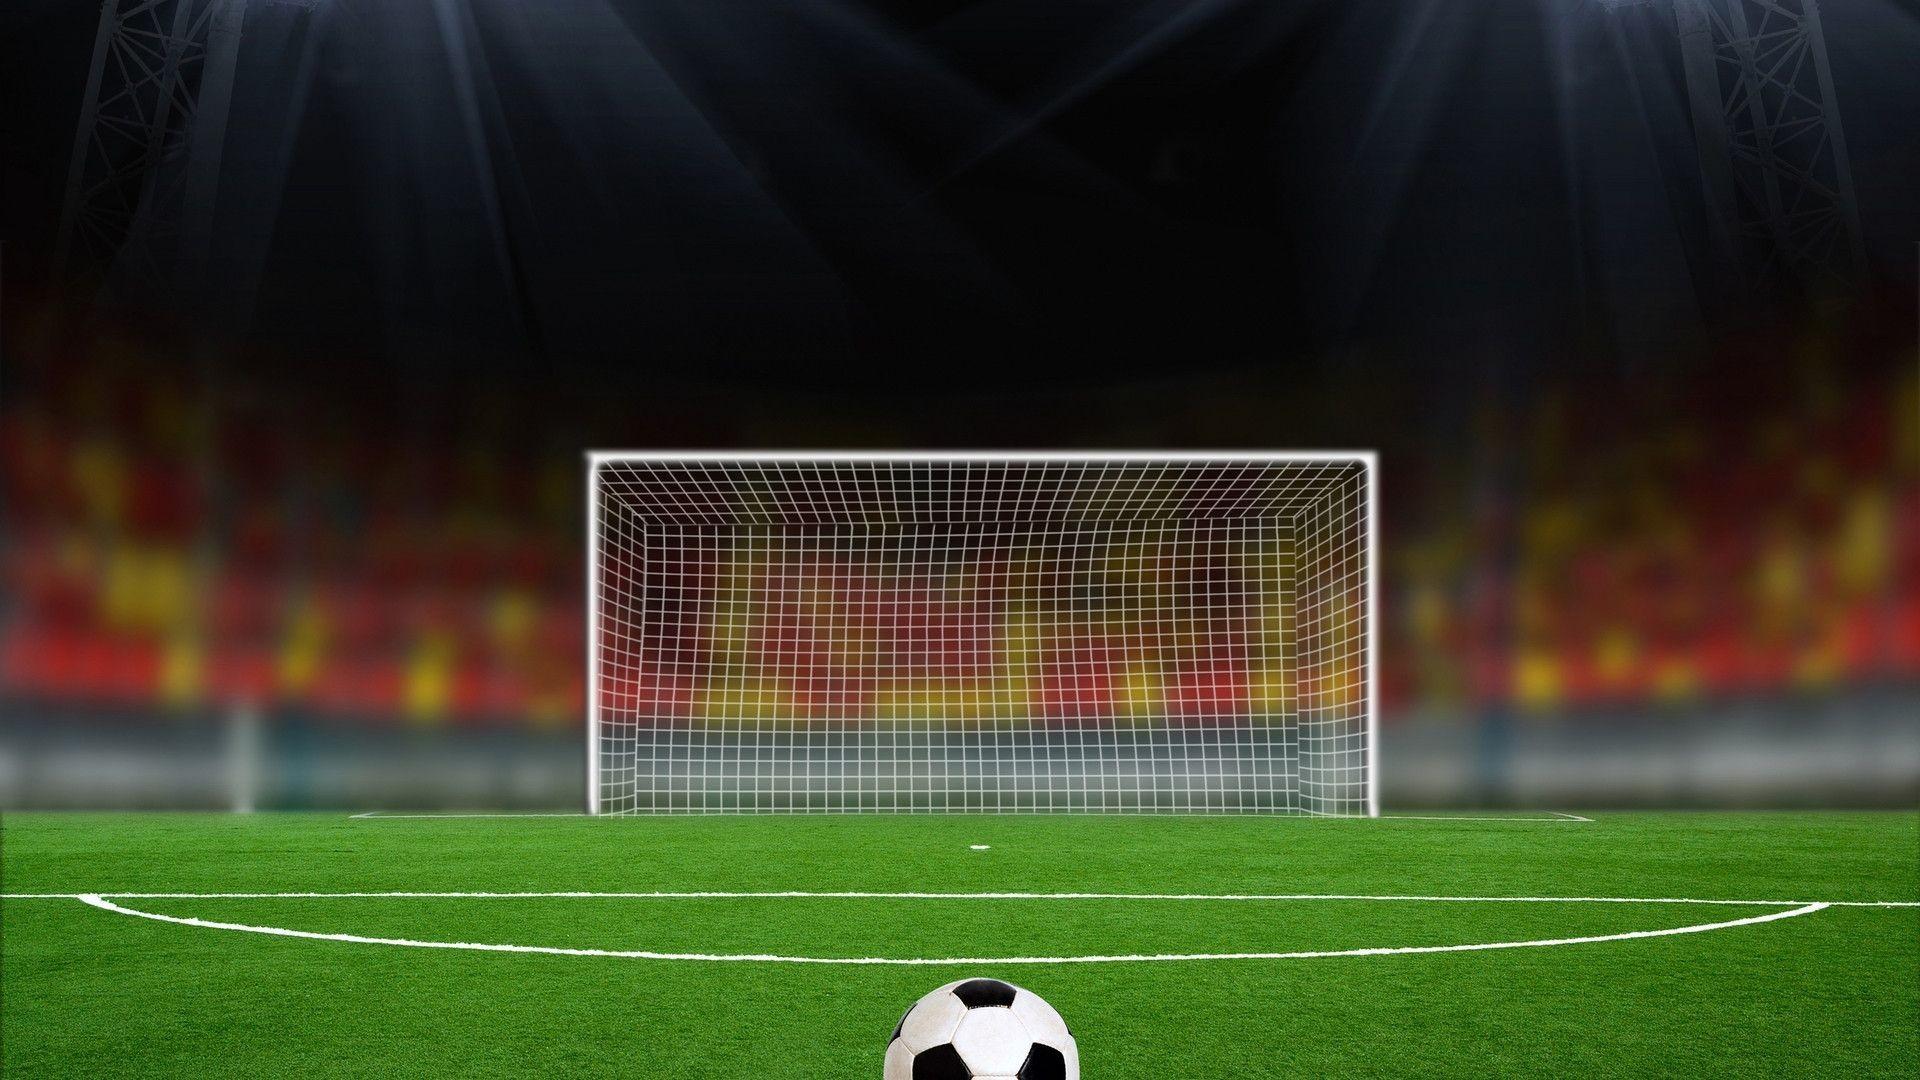 Chelsea Football Club Wallpaper Football Wallpaper HD | HD Wallpapers |  Pinterest | Wallpaper